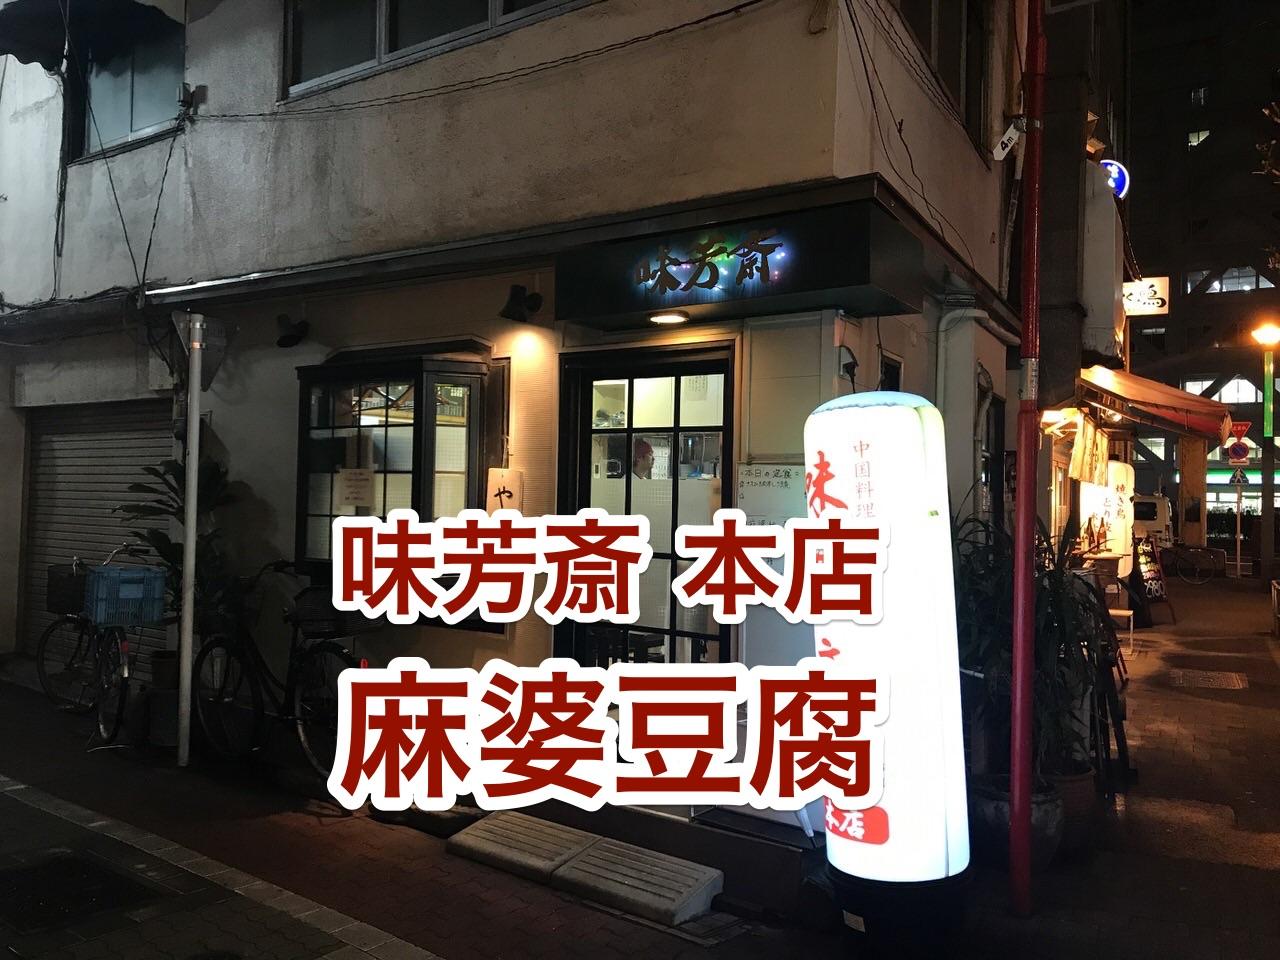 「味芳斎 本店」名物の麻婆豆腐と重慶紅焼牛肉